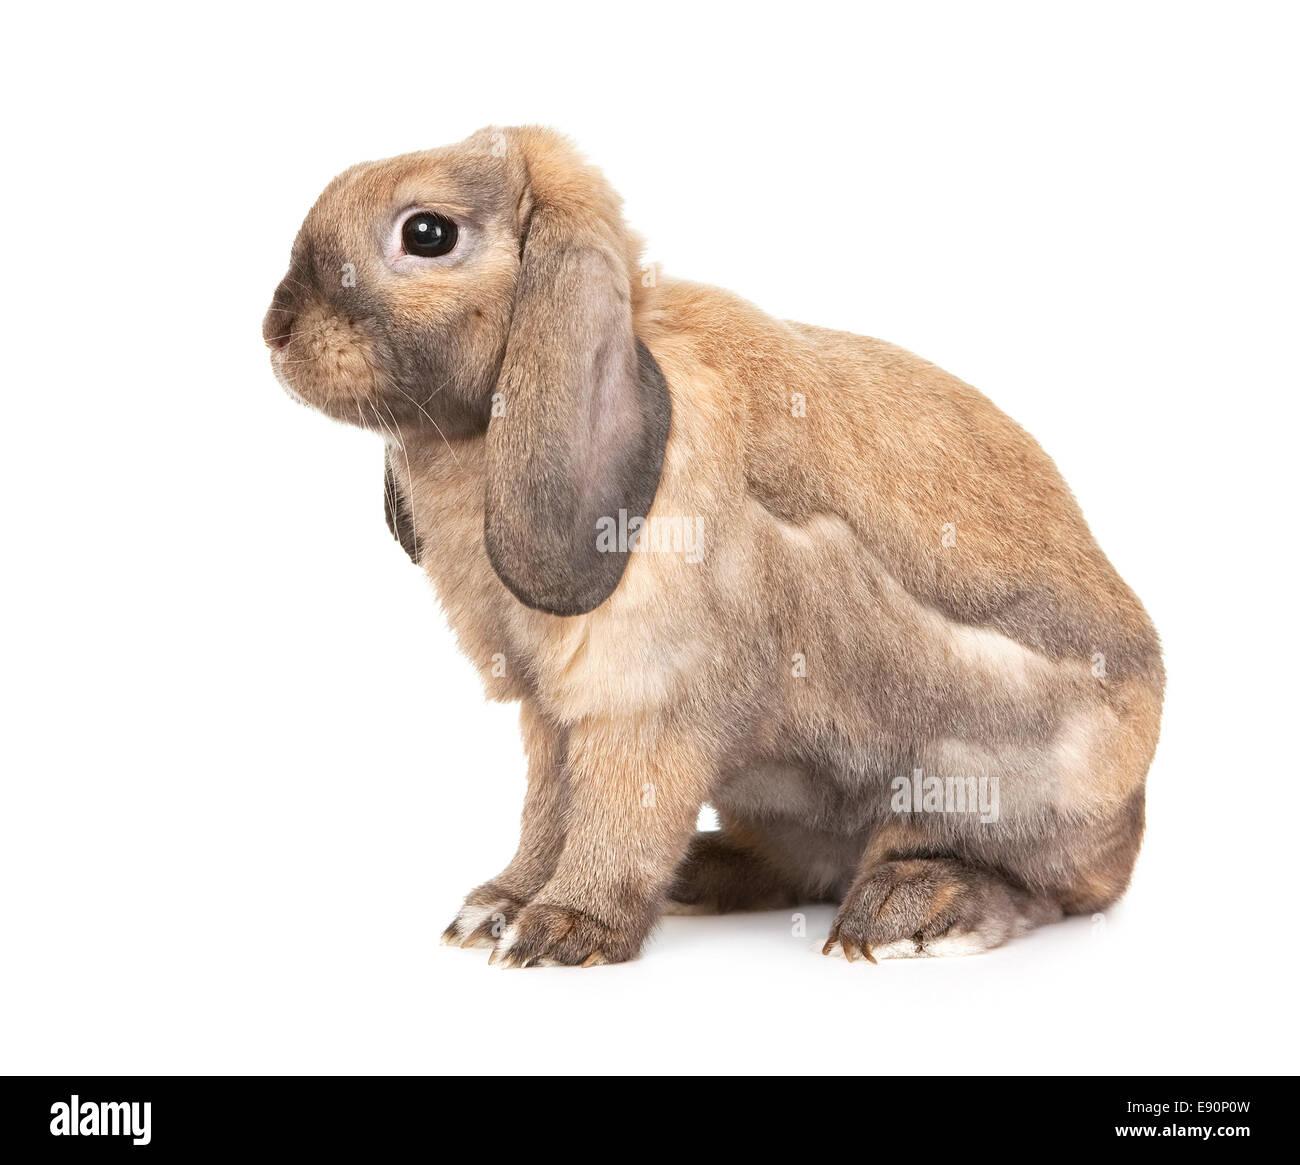 Rabbits are rams. Dwarf Rabbit Ram: breed description 16